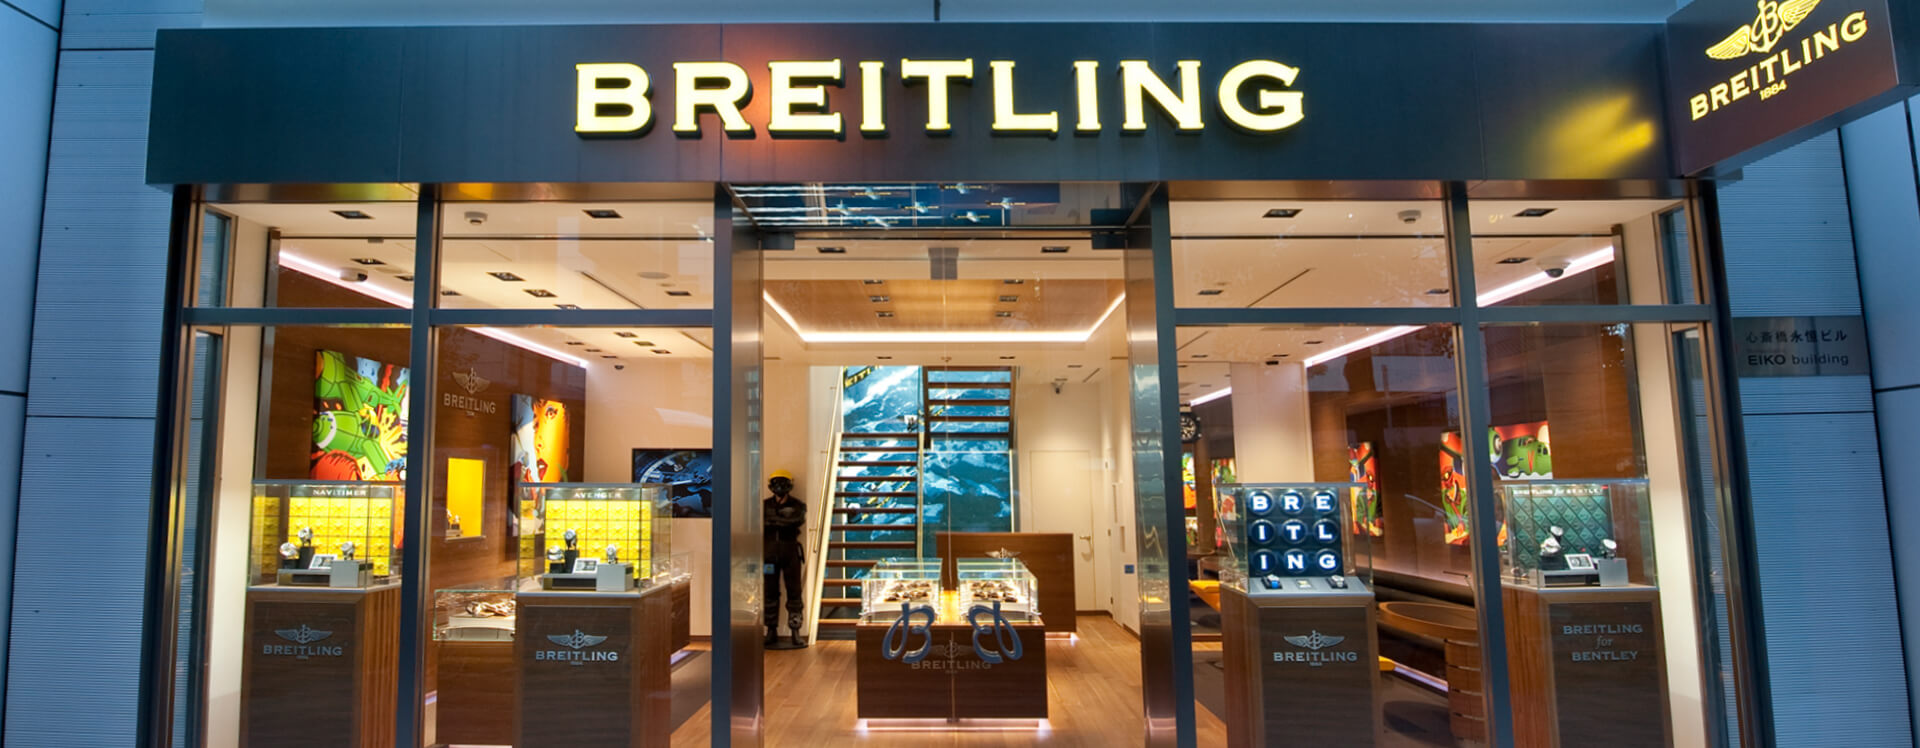 BREITLING BOUTIQUE OSAKA ブライトリング・ブティック 大阪